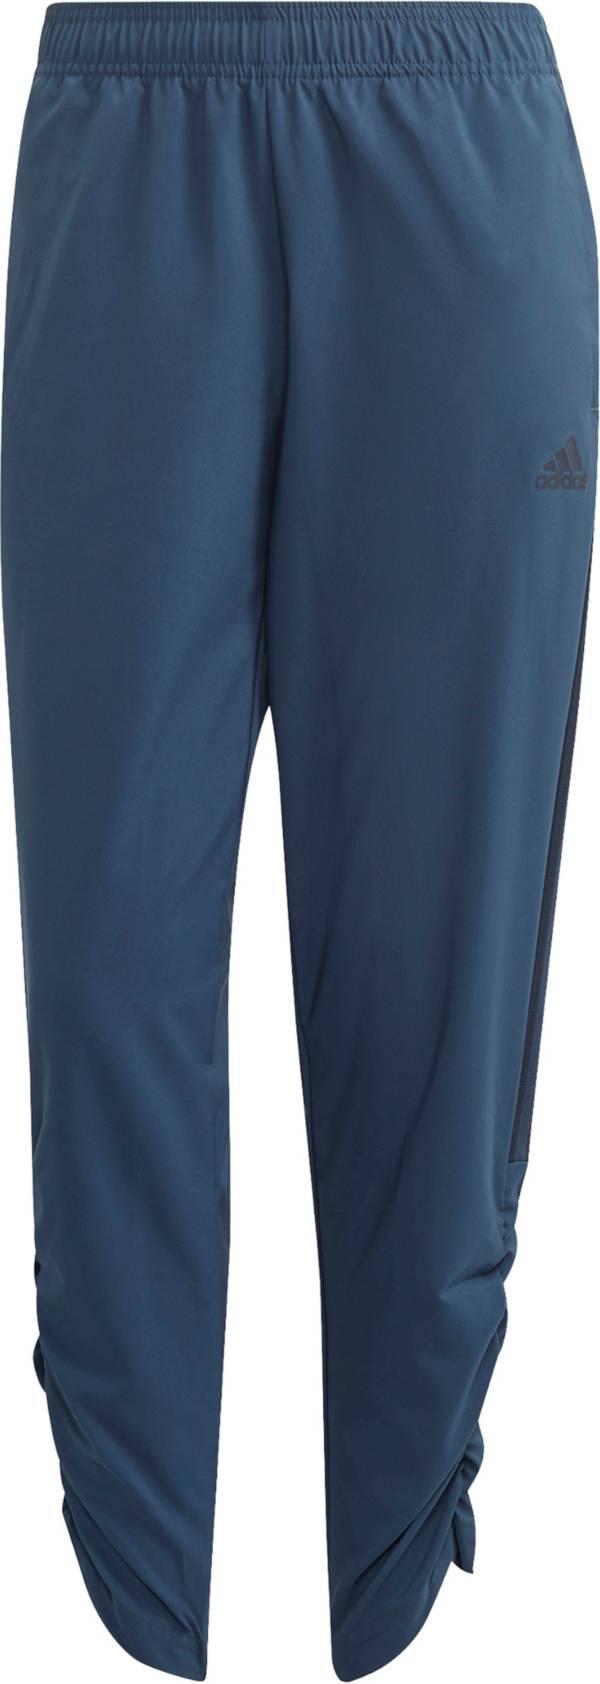 adidas Women's Tiro Ruche Pants product image